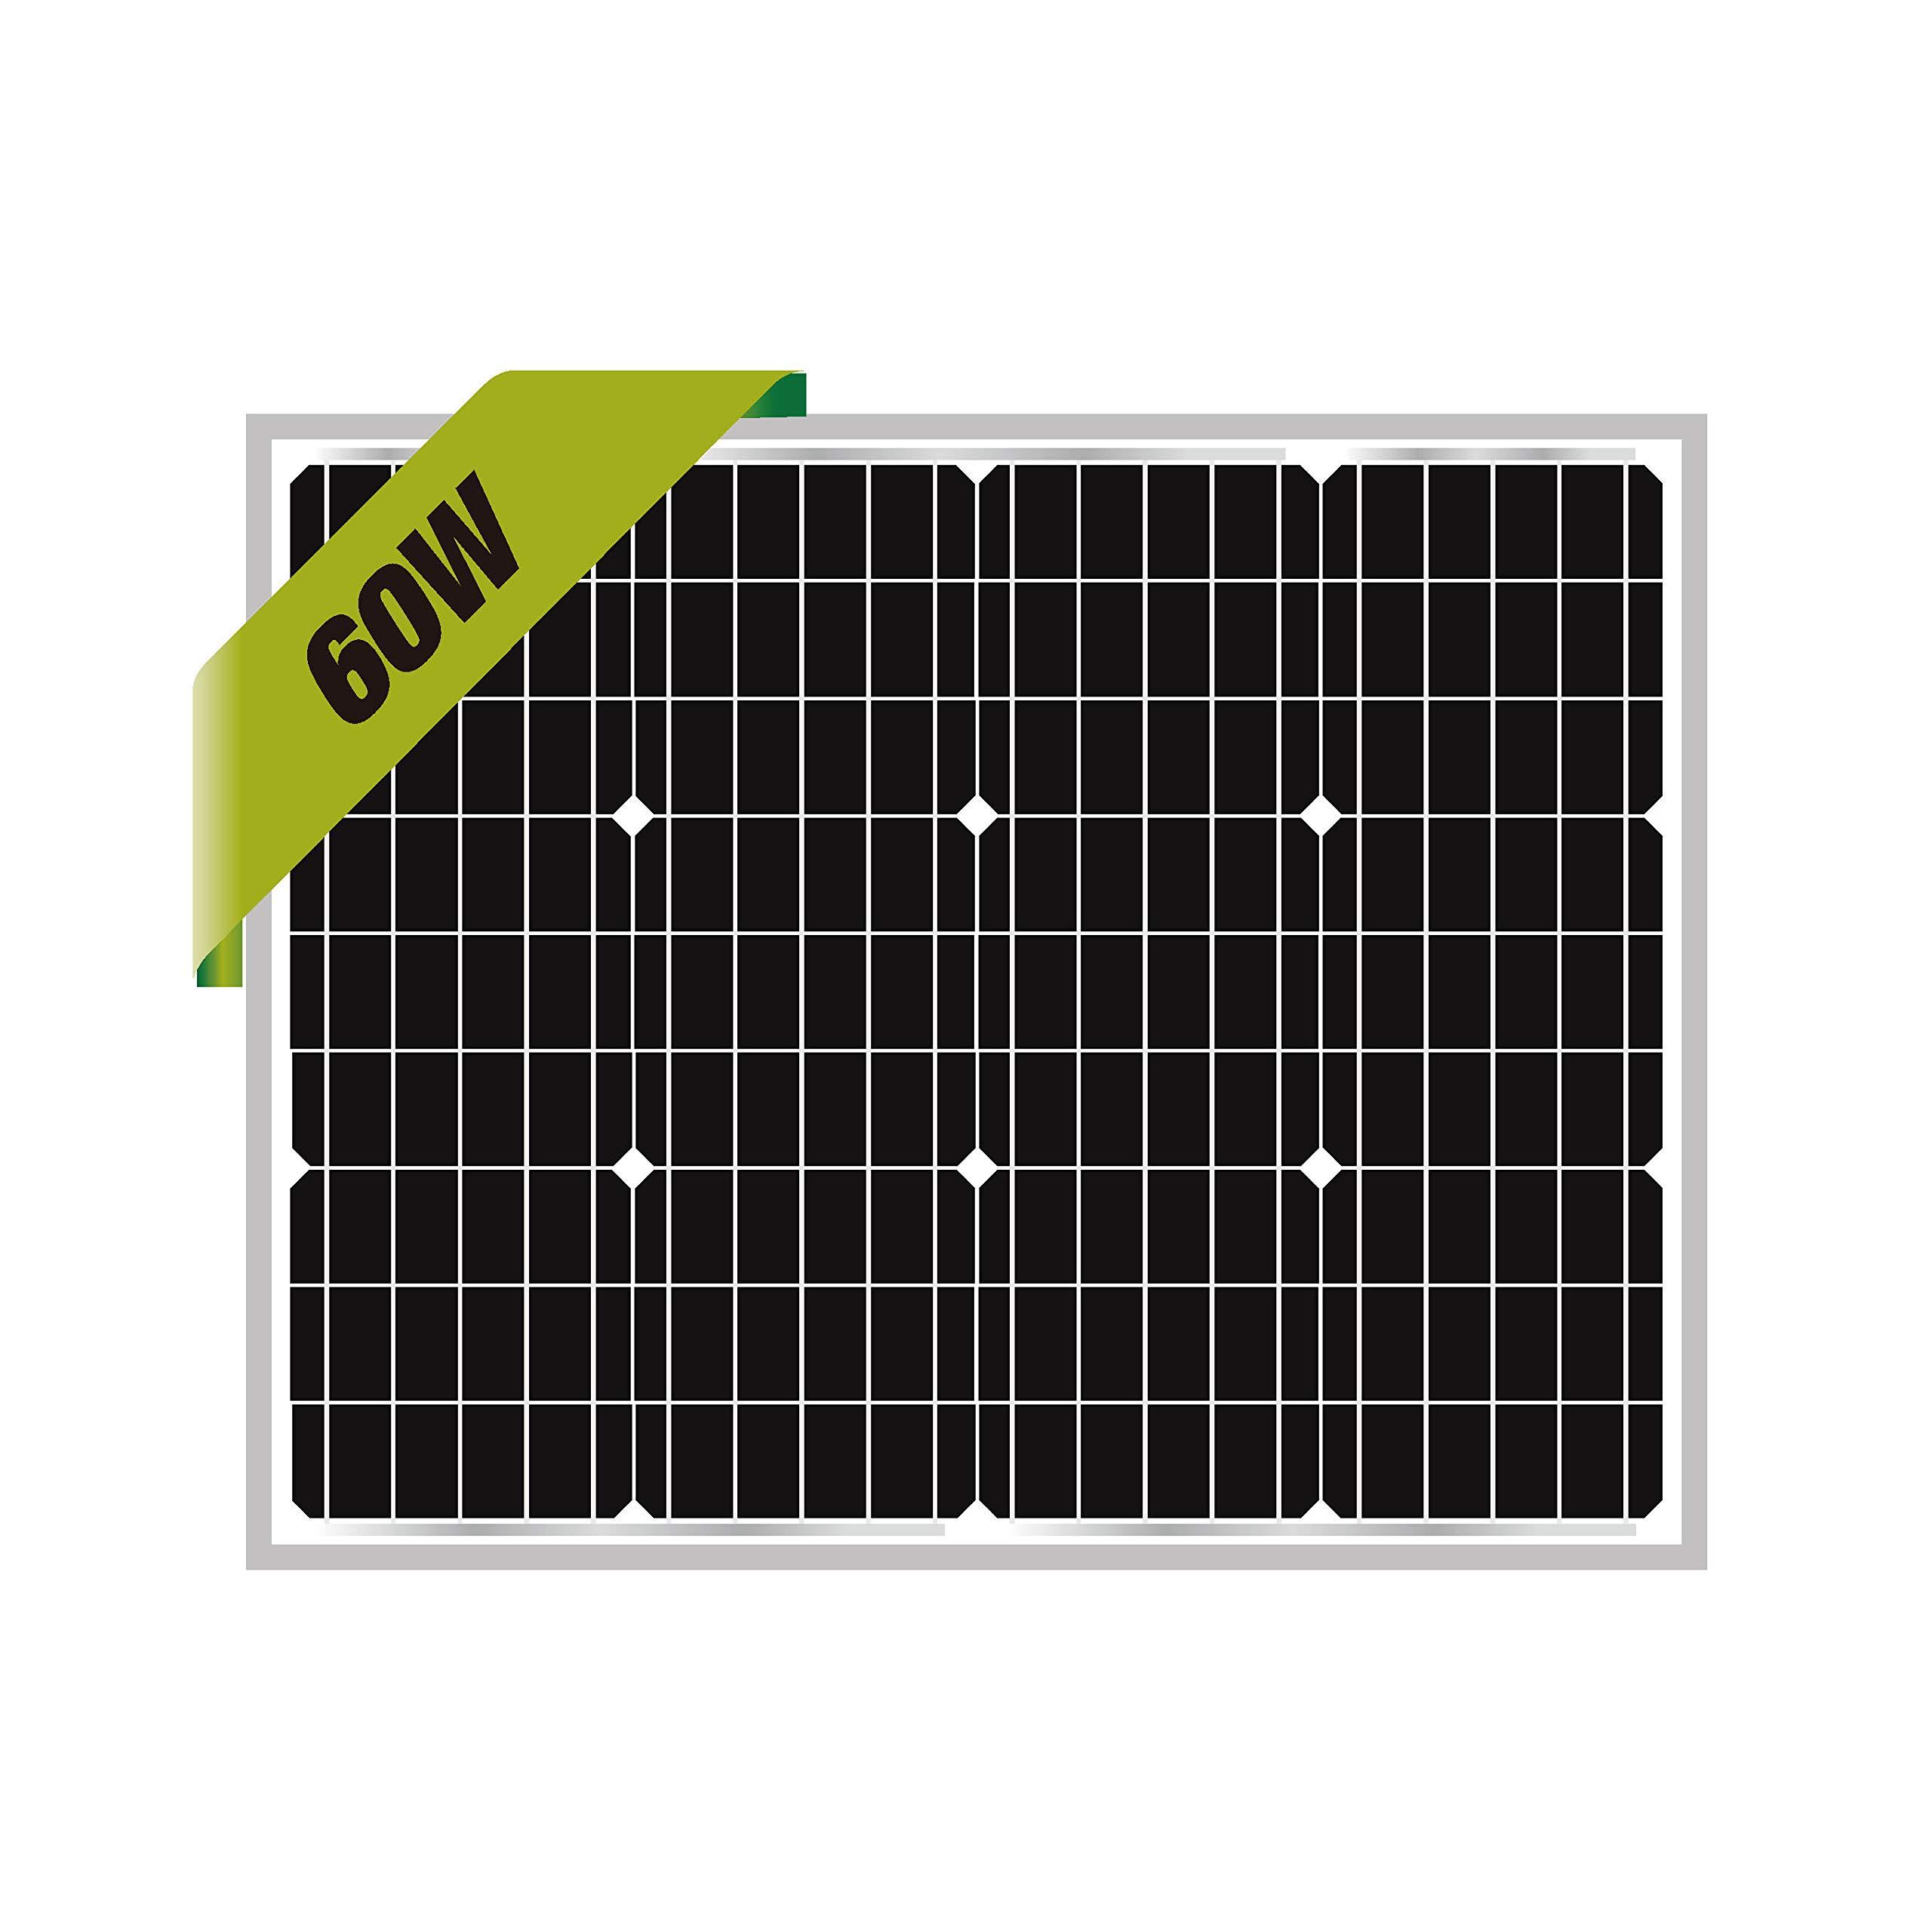 Newpowa 60W Mono Solar Panel 60 Watts Monocrystalline for RV,Boat,Home Off Grid System (Same Size as 50W) by Newpowa